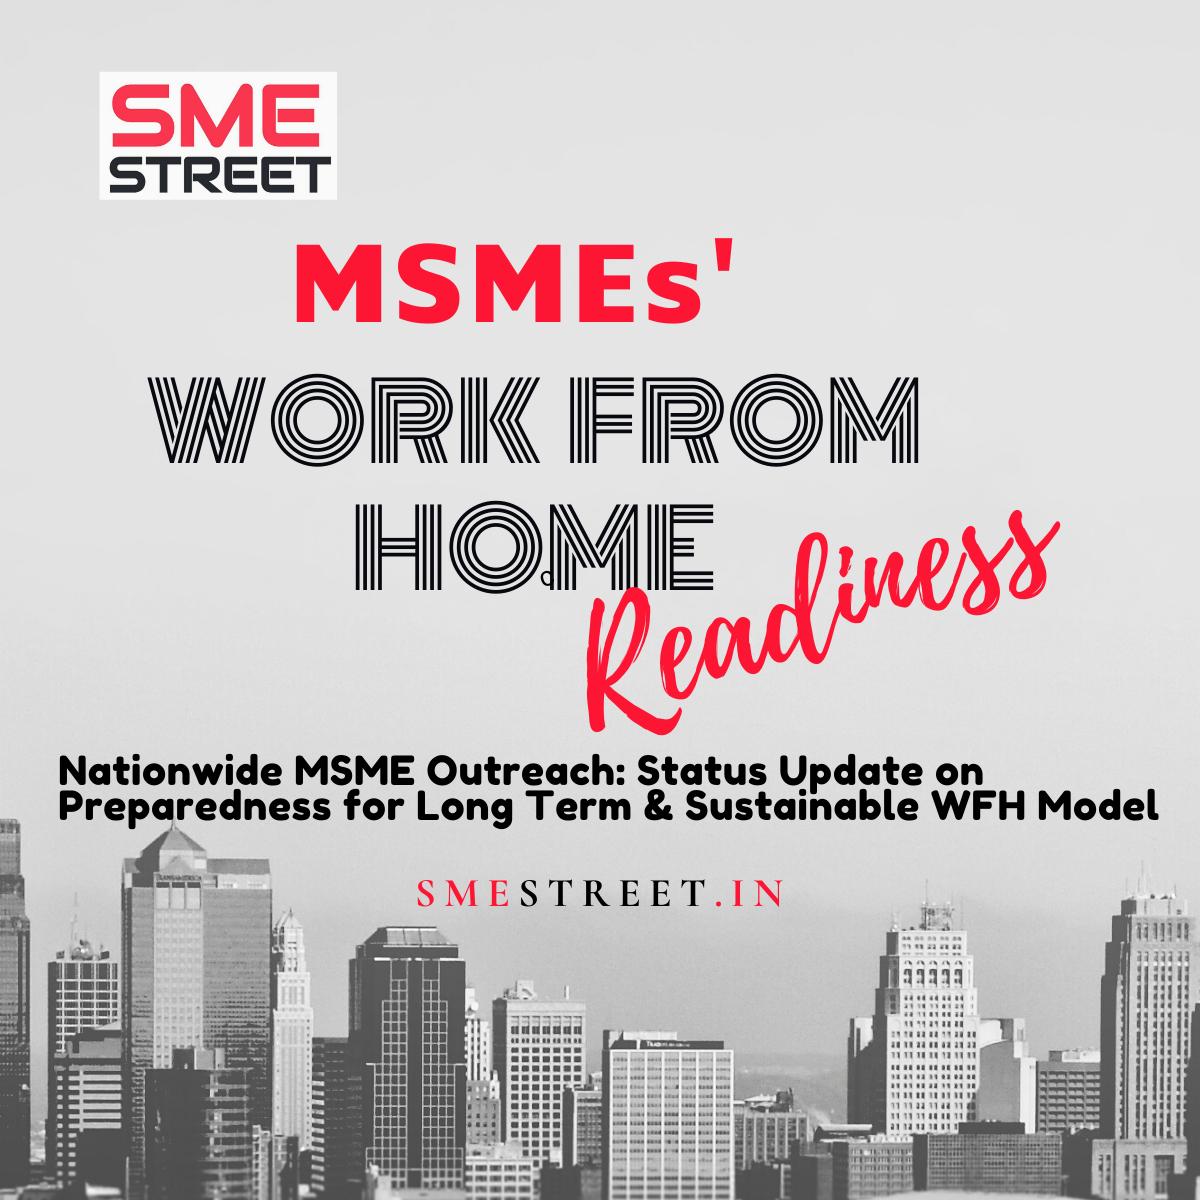 Work from Home, SMESTreet, SMEStreet Survey